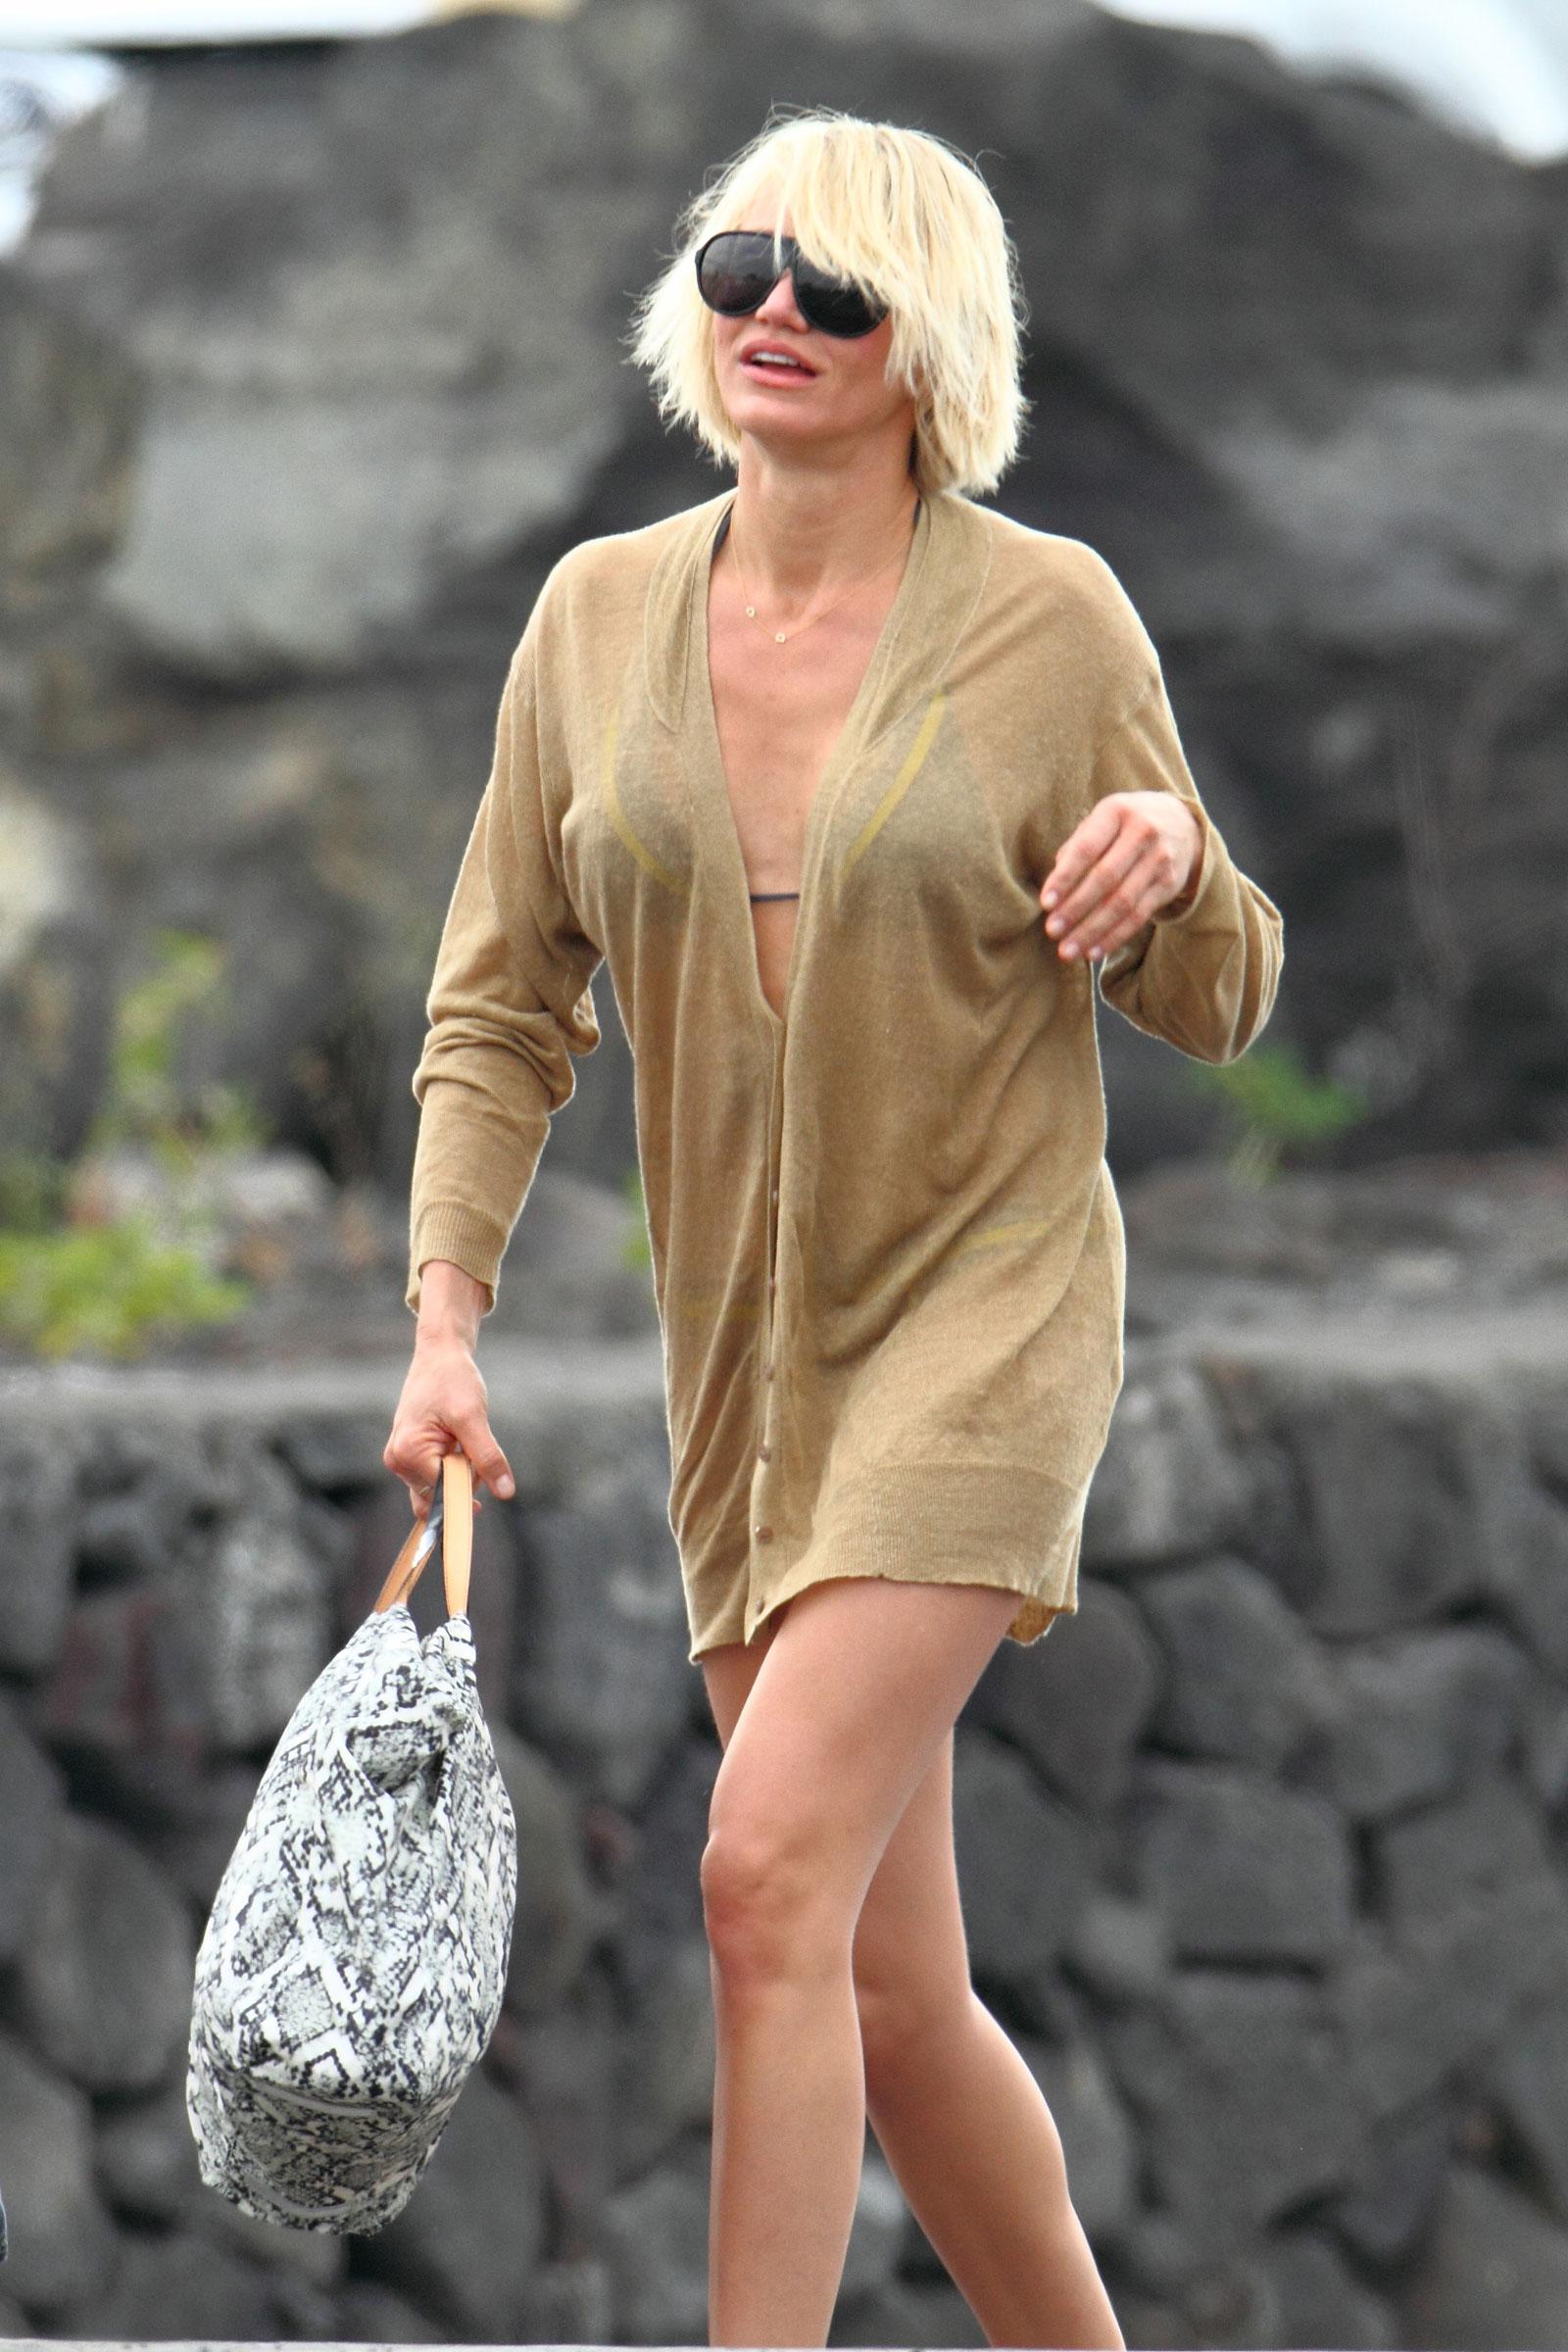 Cameron Diaz Bikini Candids on the Beach in Hawaii ... Cameron Diaz Pregnant 2019 Adoption